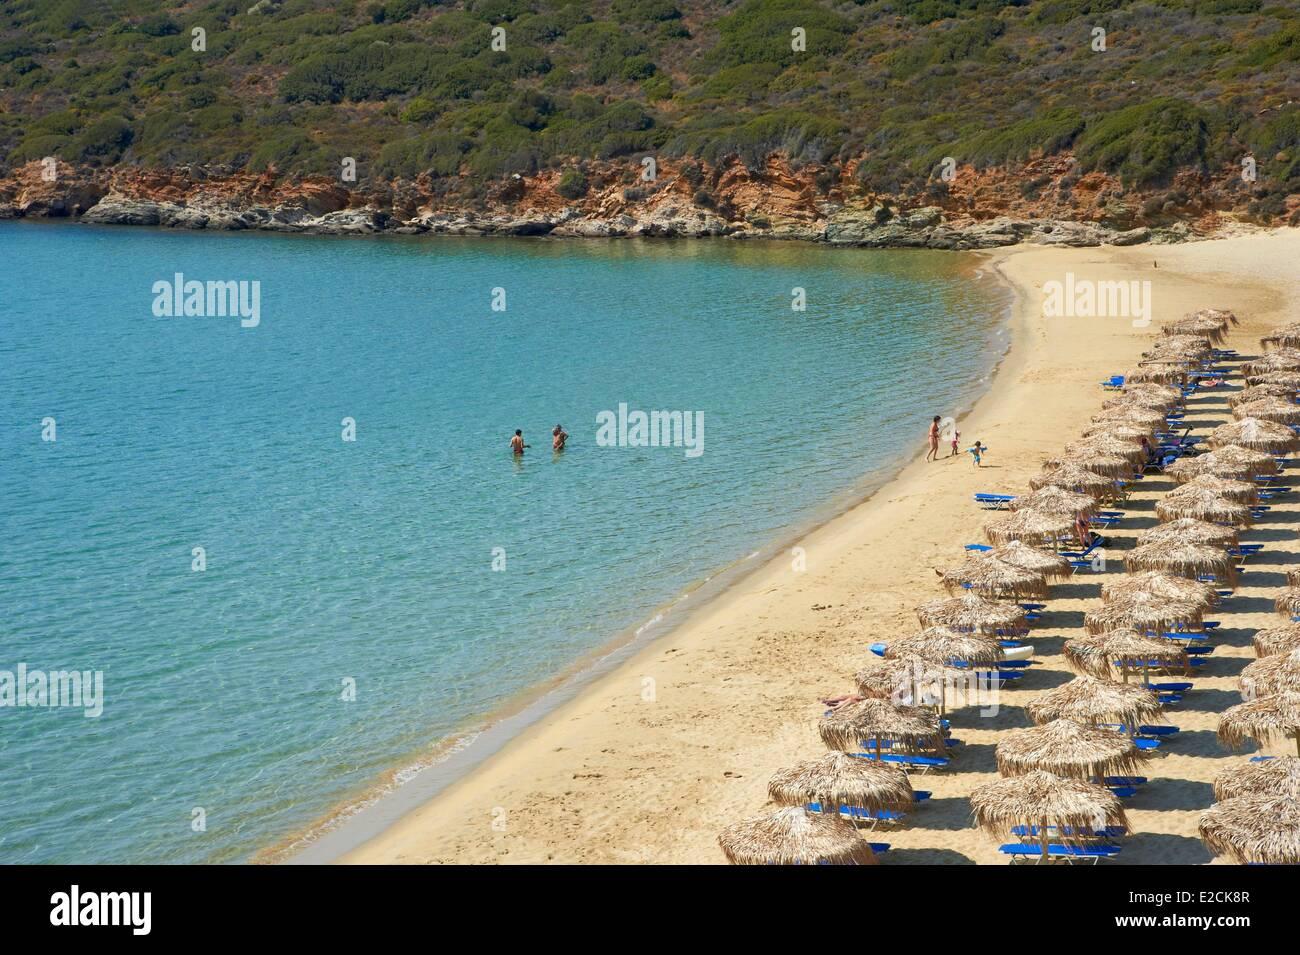 Greece Cyclades Andros island Agios Petros beach Stock Photo